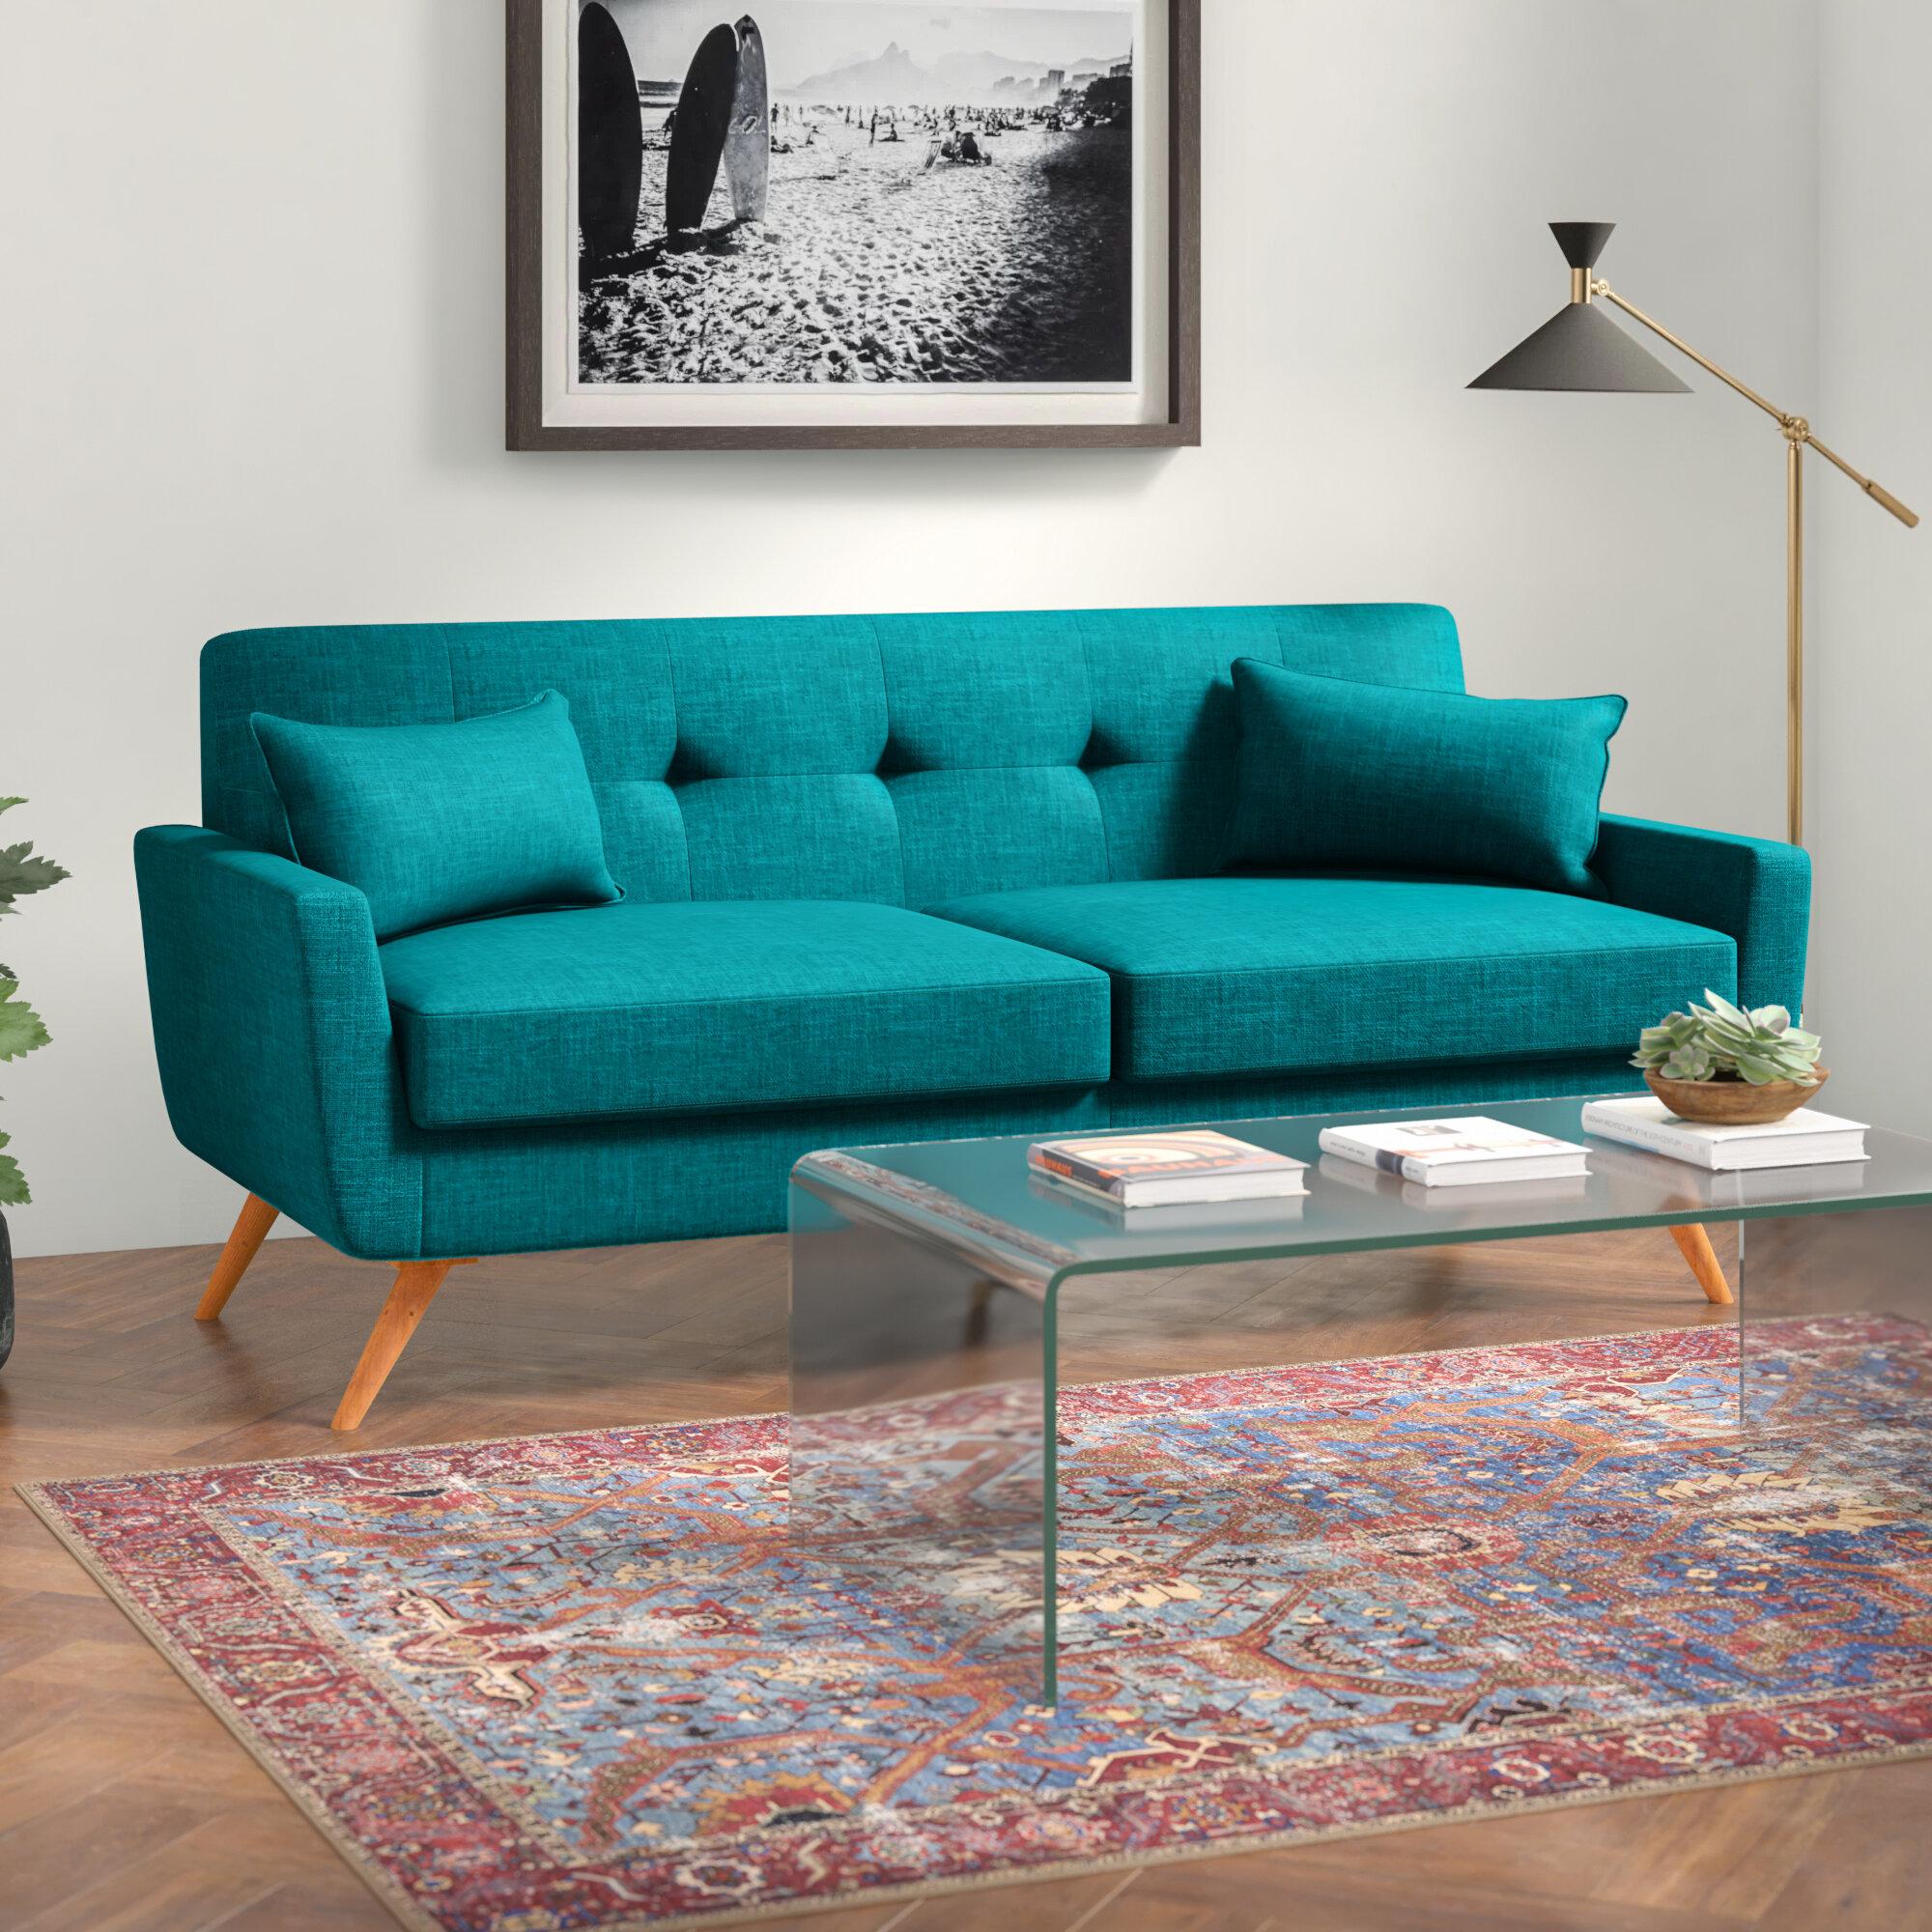 Remarkable Norton St Philip Sofa Andrewgaddart Wooden Chair Designs For Living Room Andrewgaddartcom